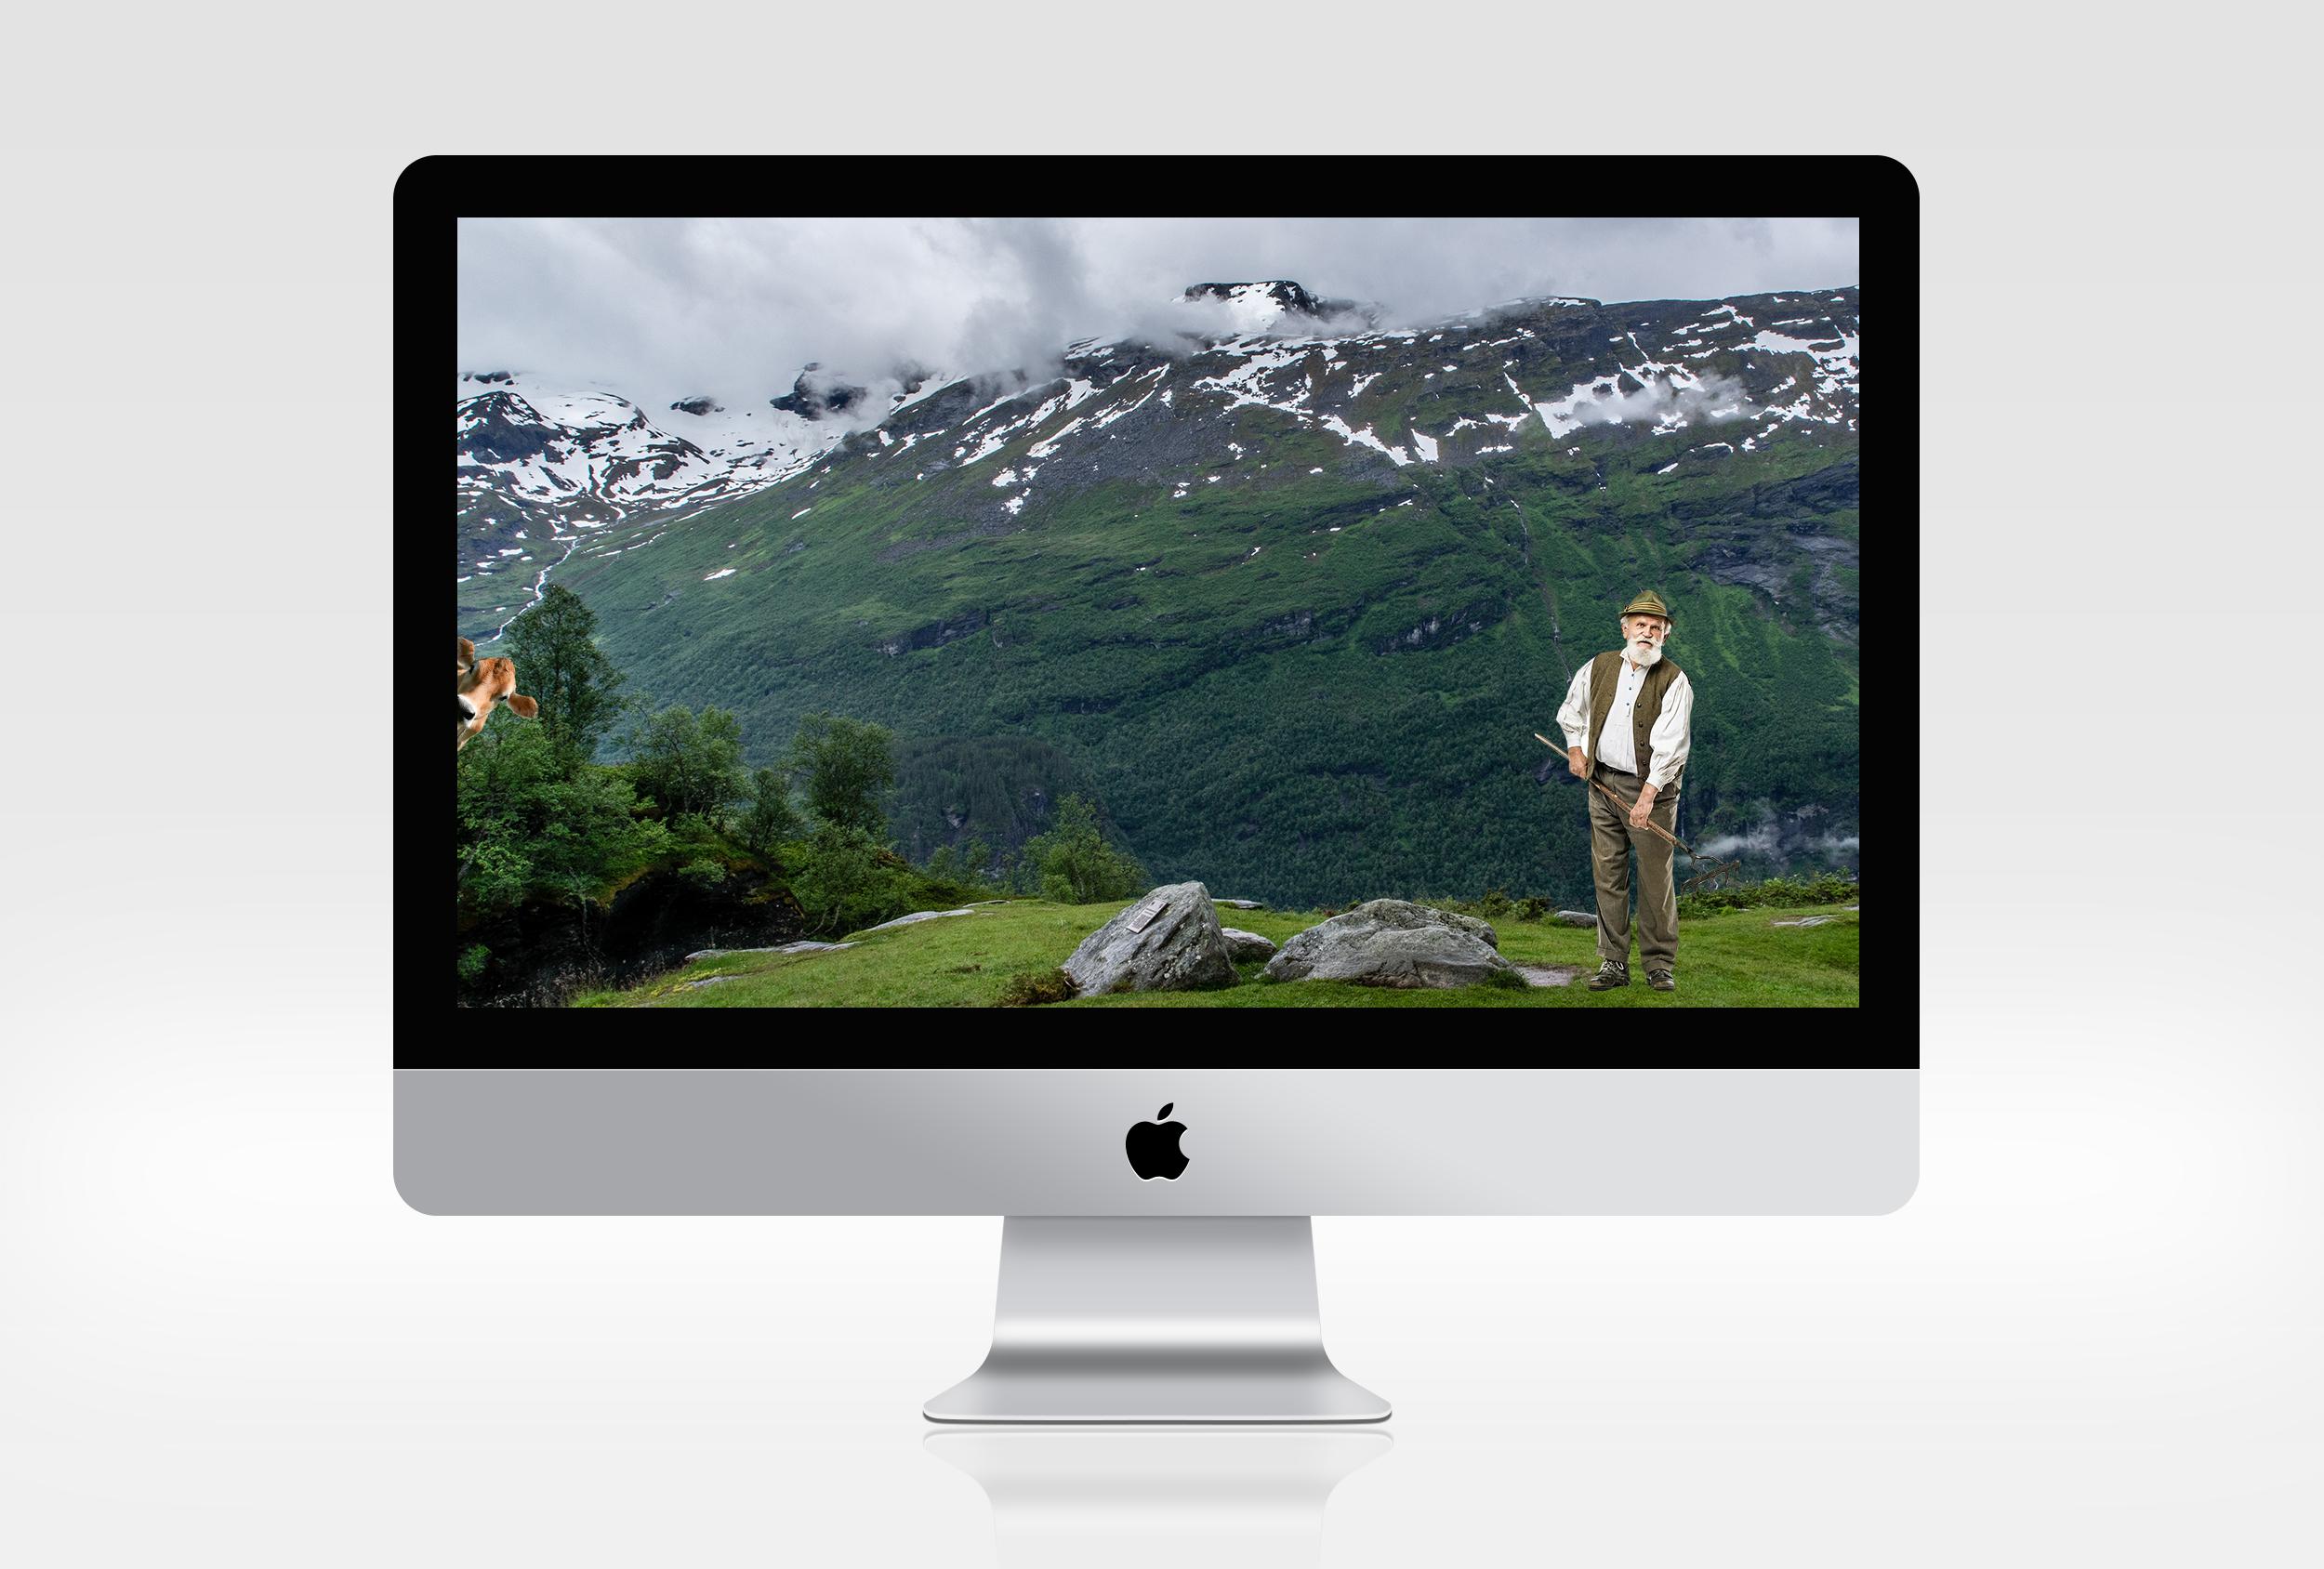 iMac-psd-mockup-template-3.png